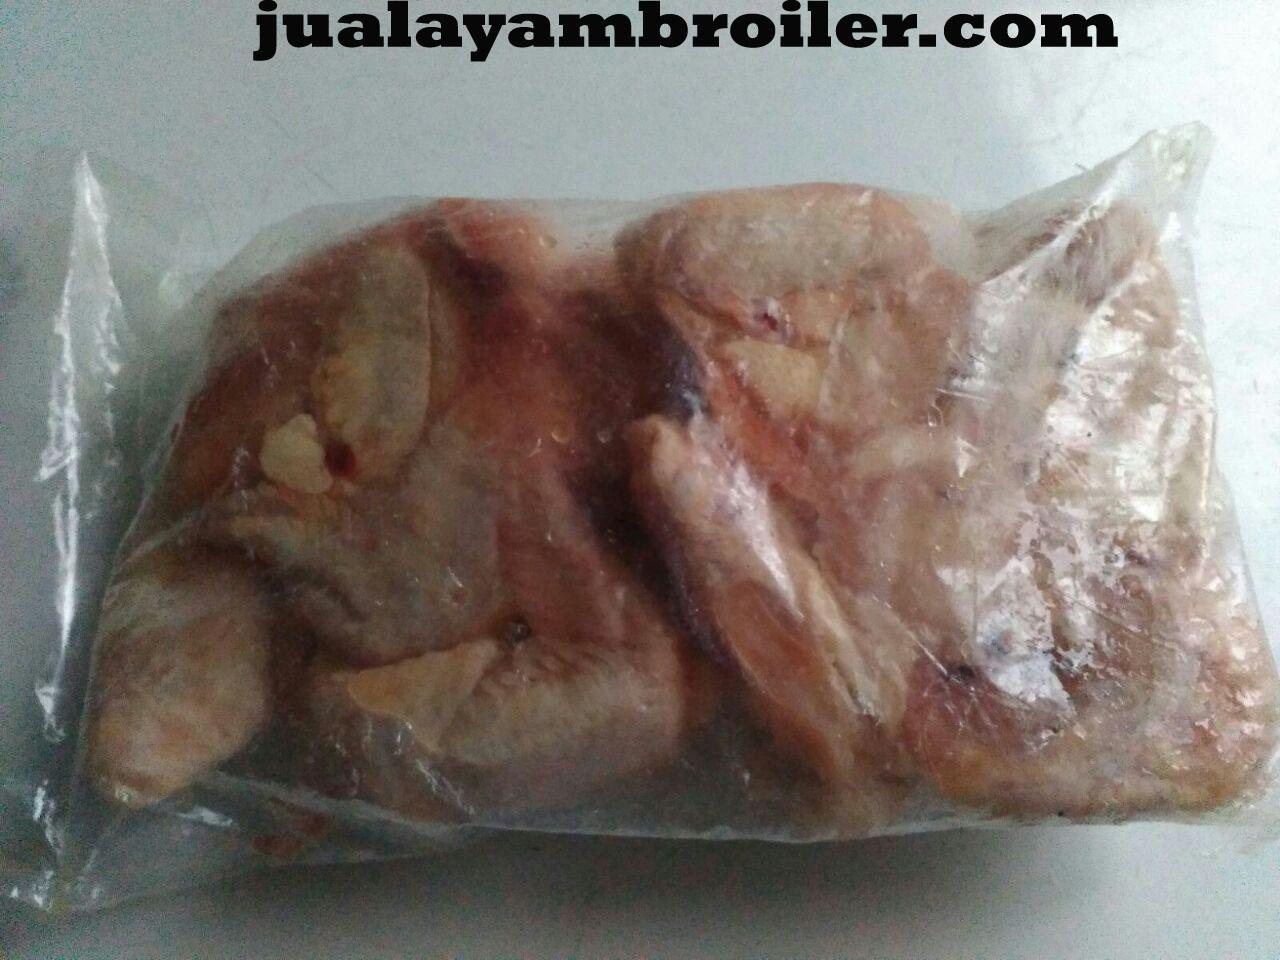 Jual Ayam Karkas di Menteng Jakarta Pusat